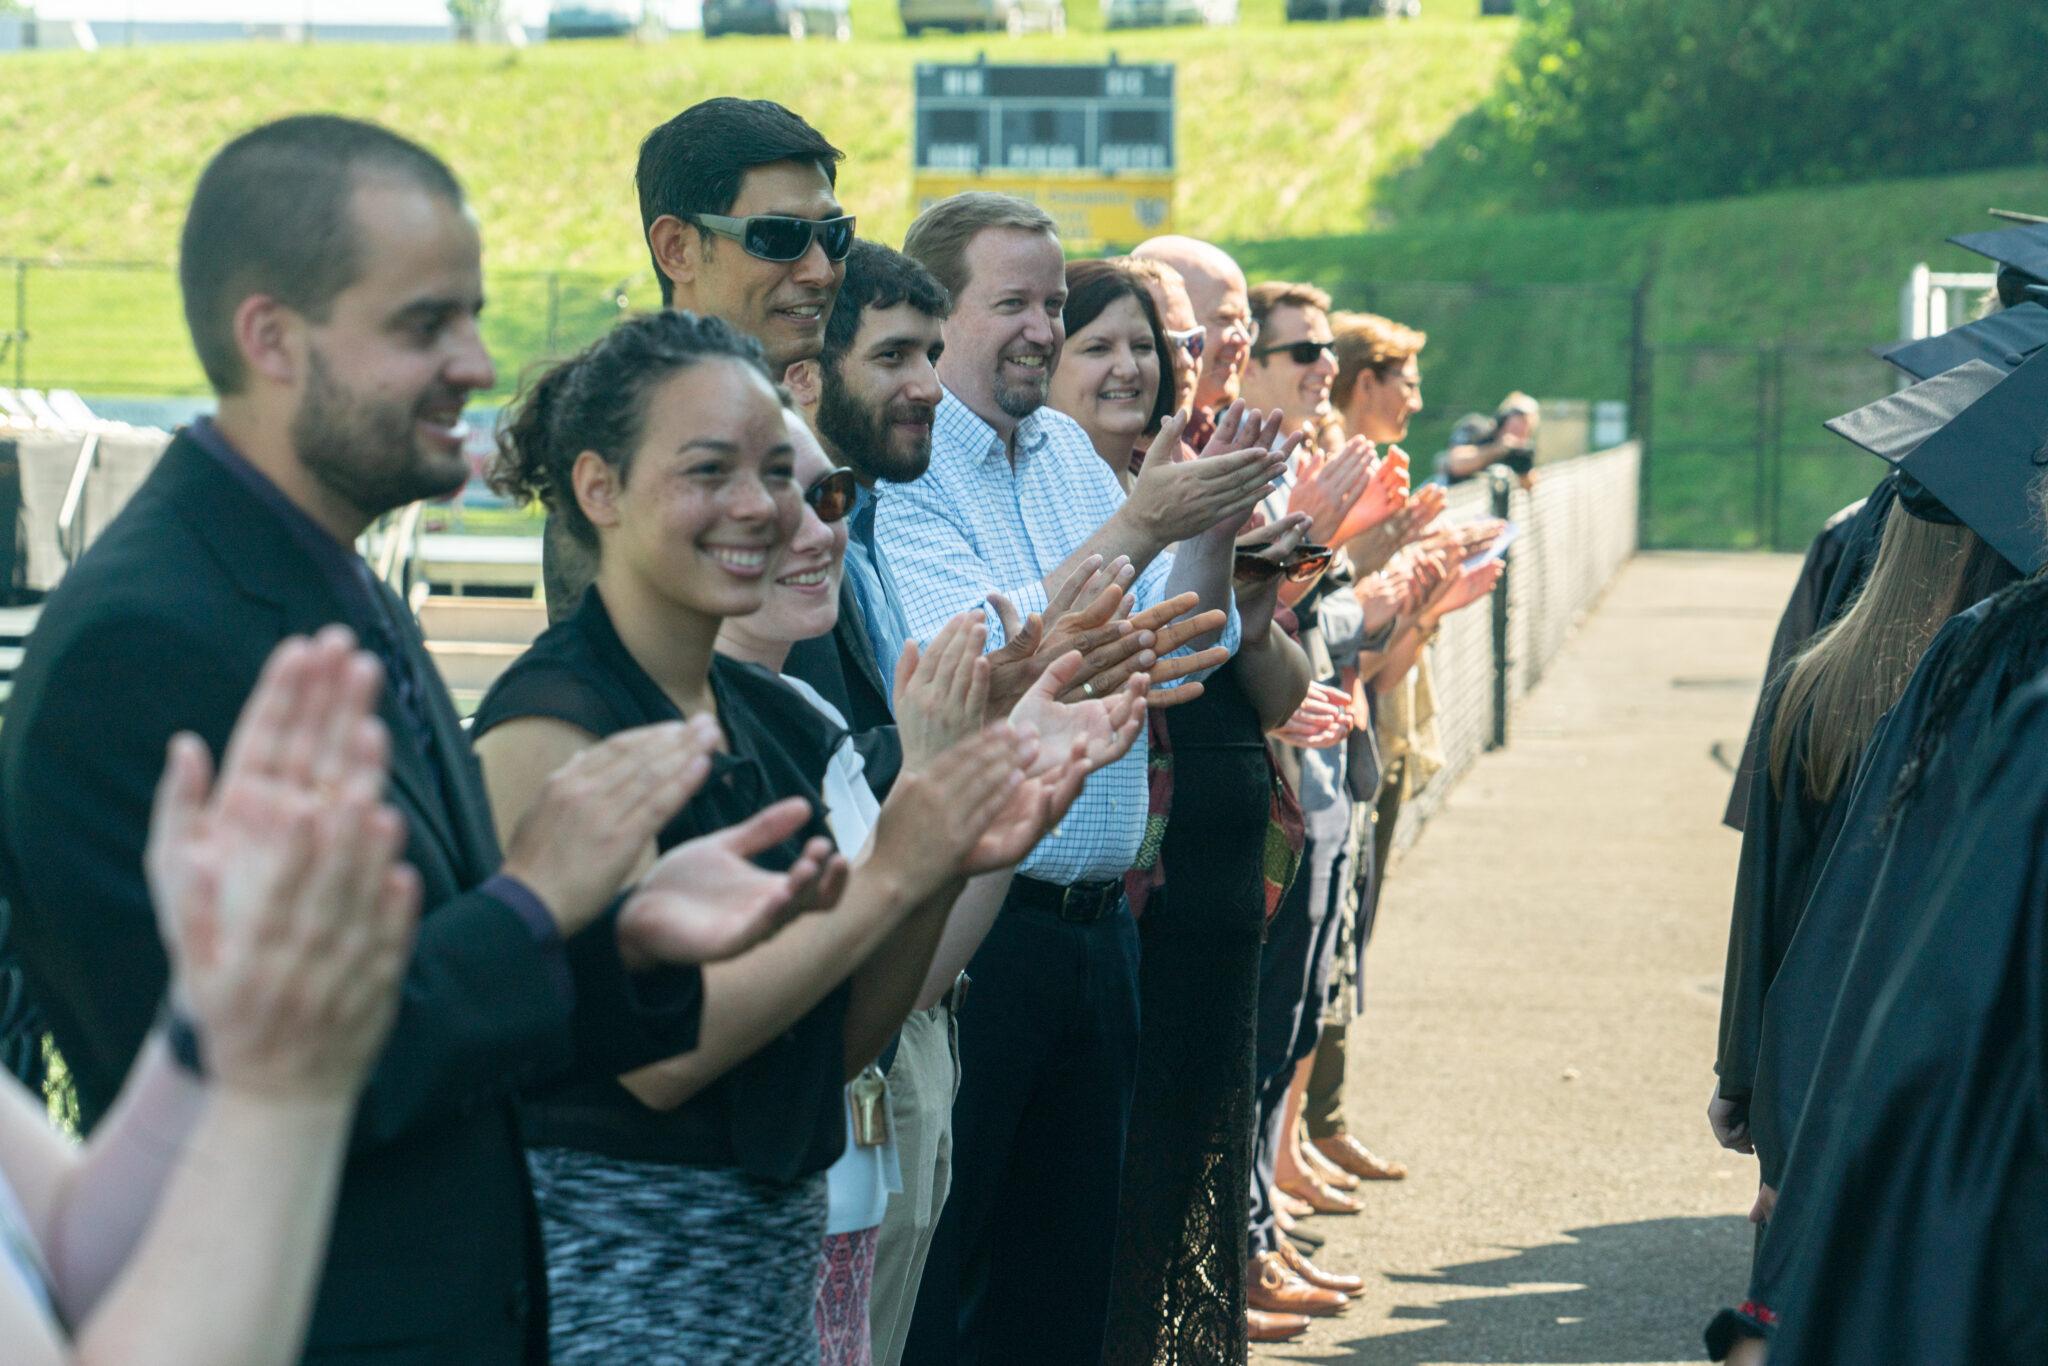 teachers cheering on graduates walking into commencement